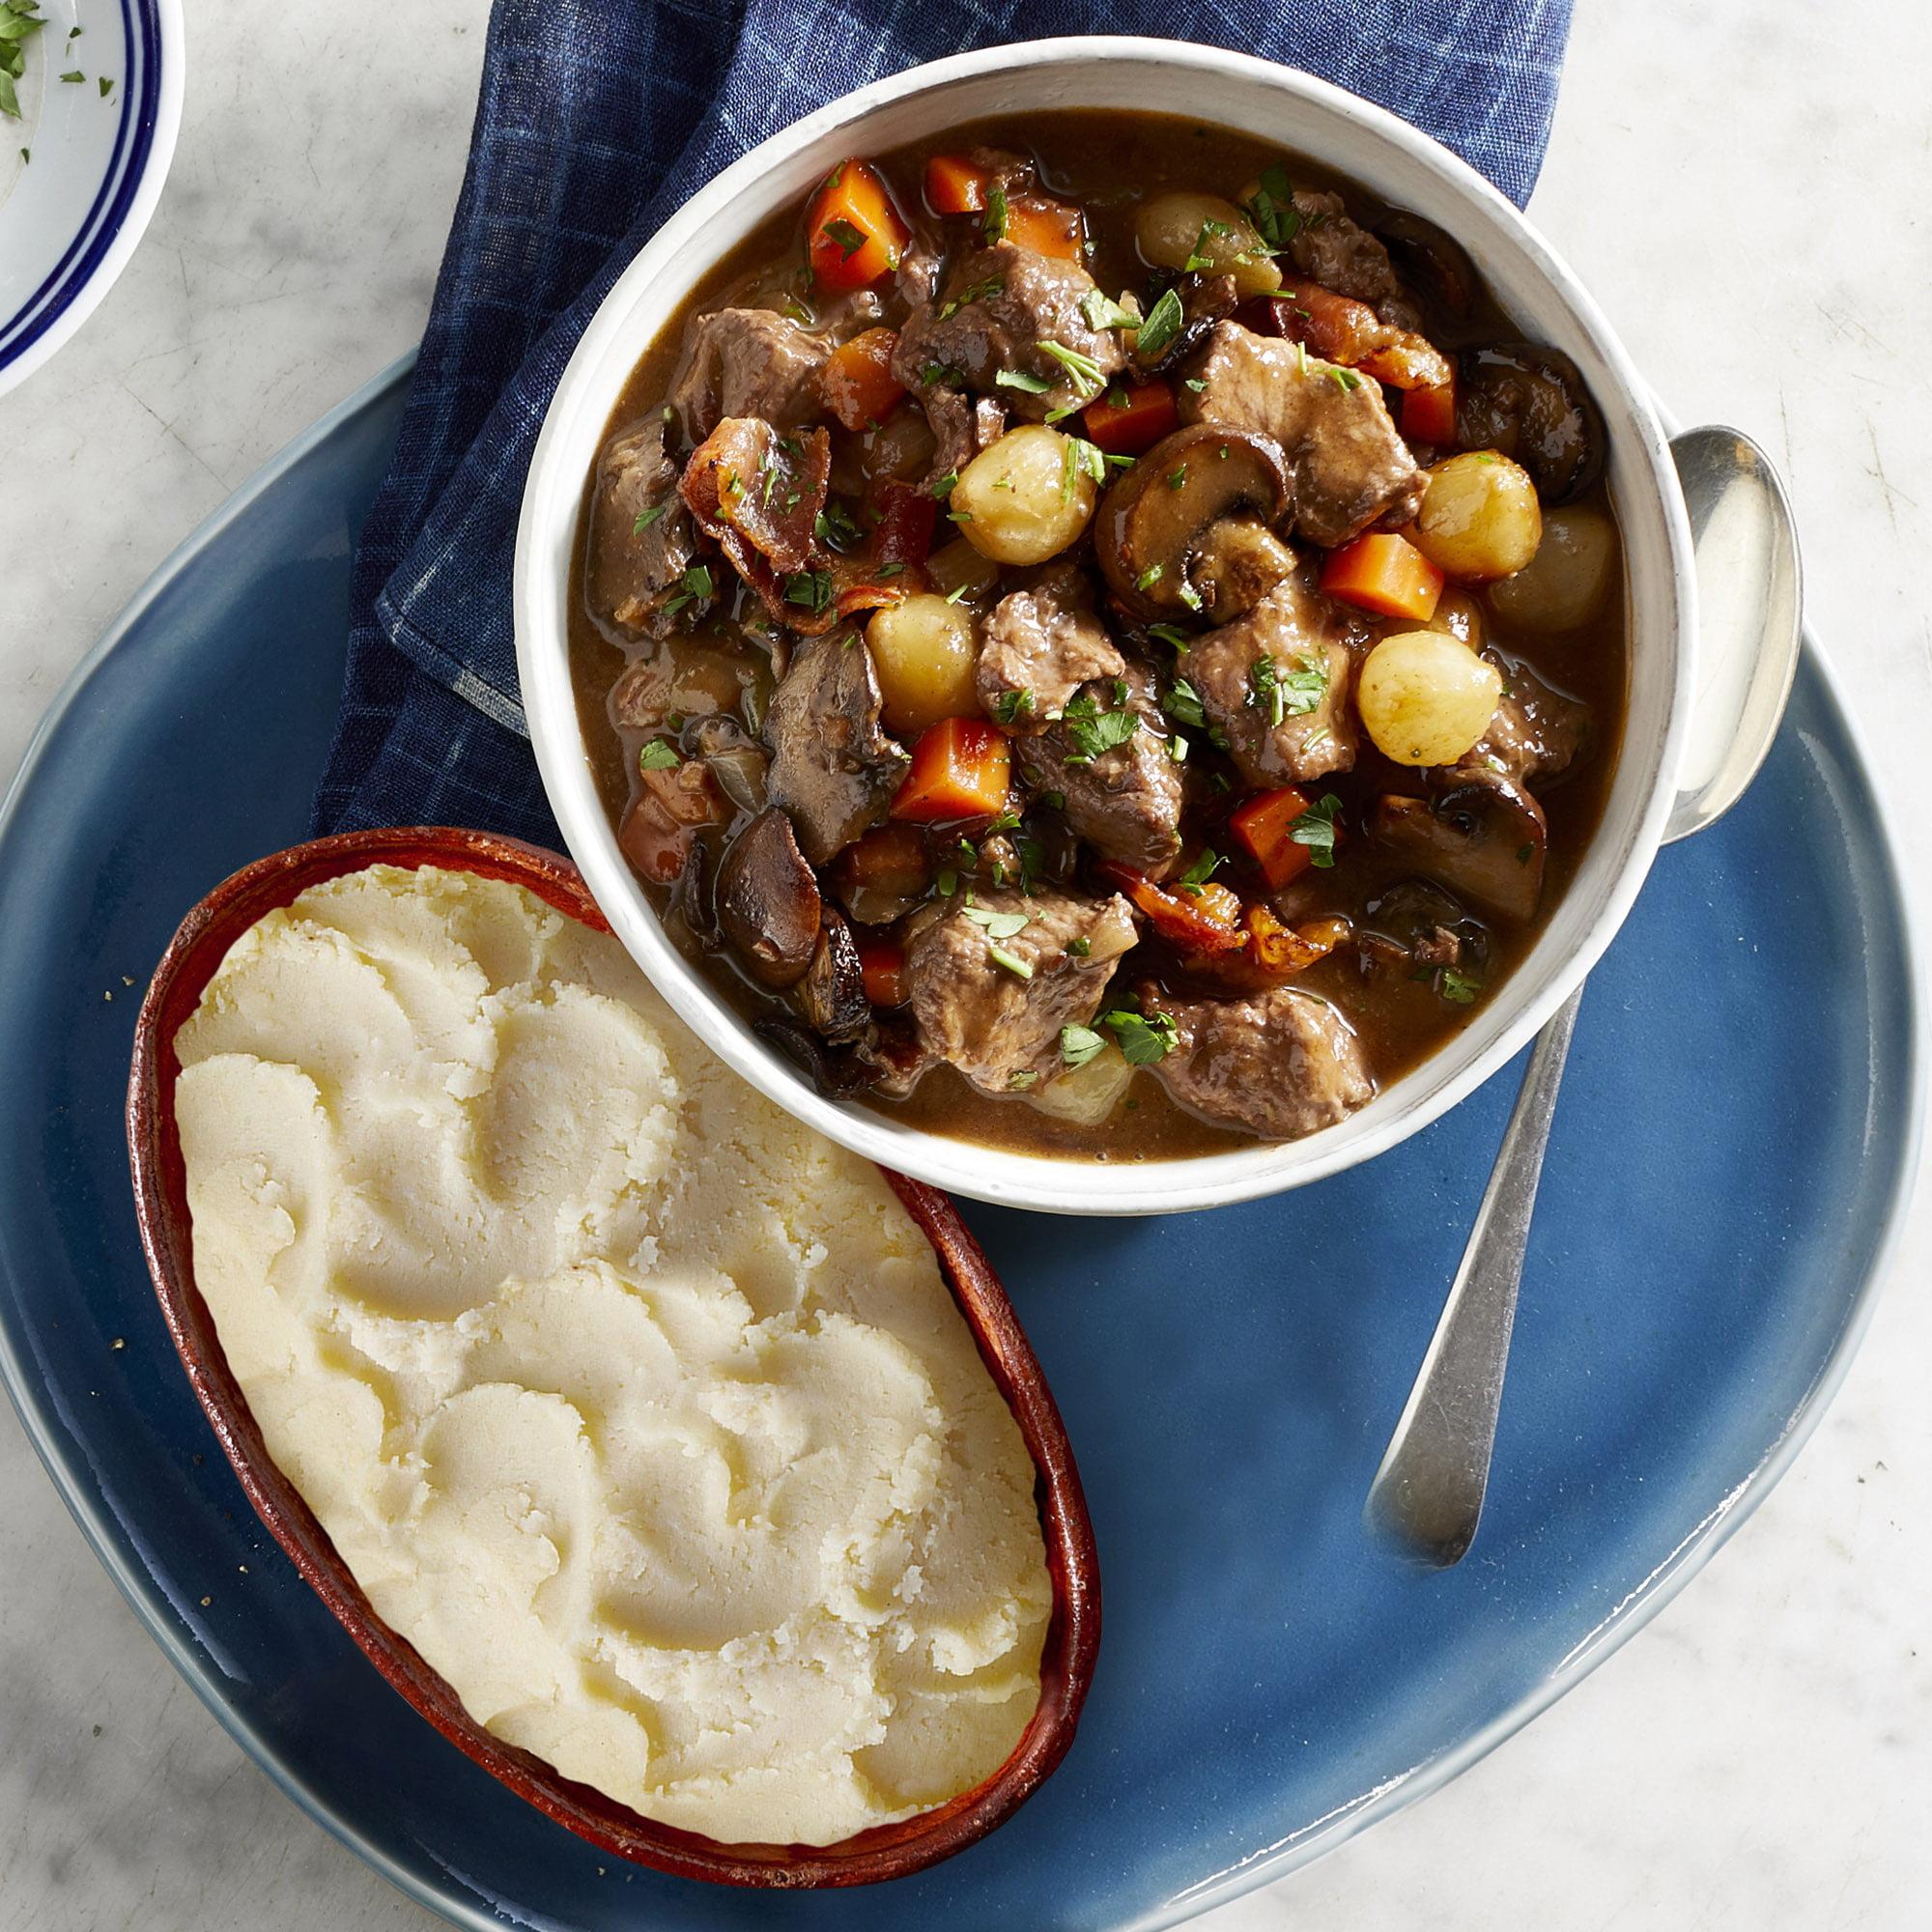 Babeth's Feast, 6 Meals, Beef Bourguignon & Simple Potato Puree - Heat & Serve